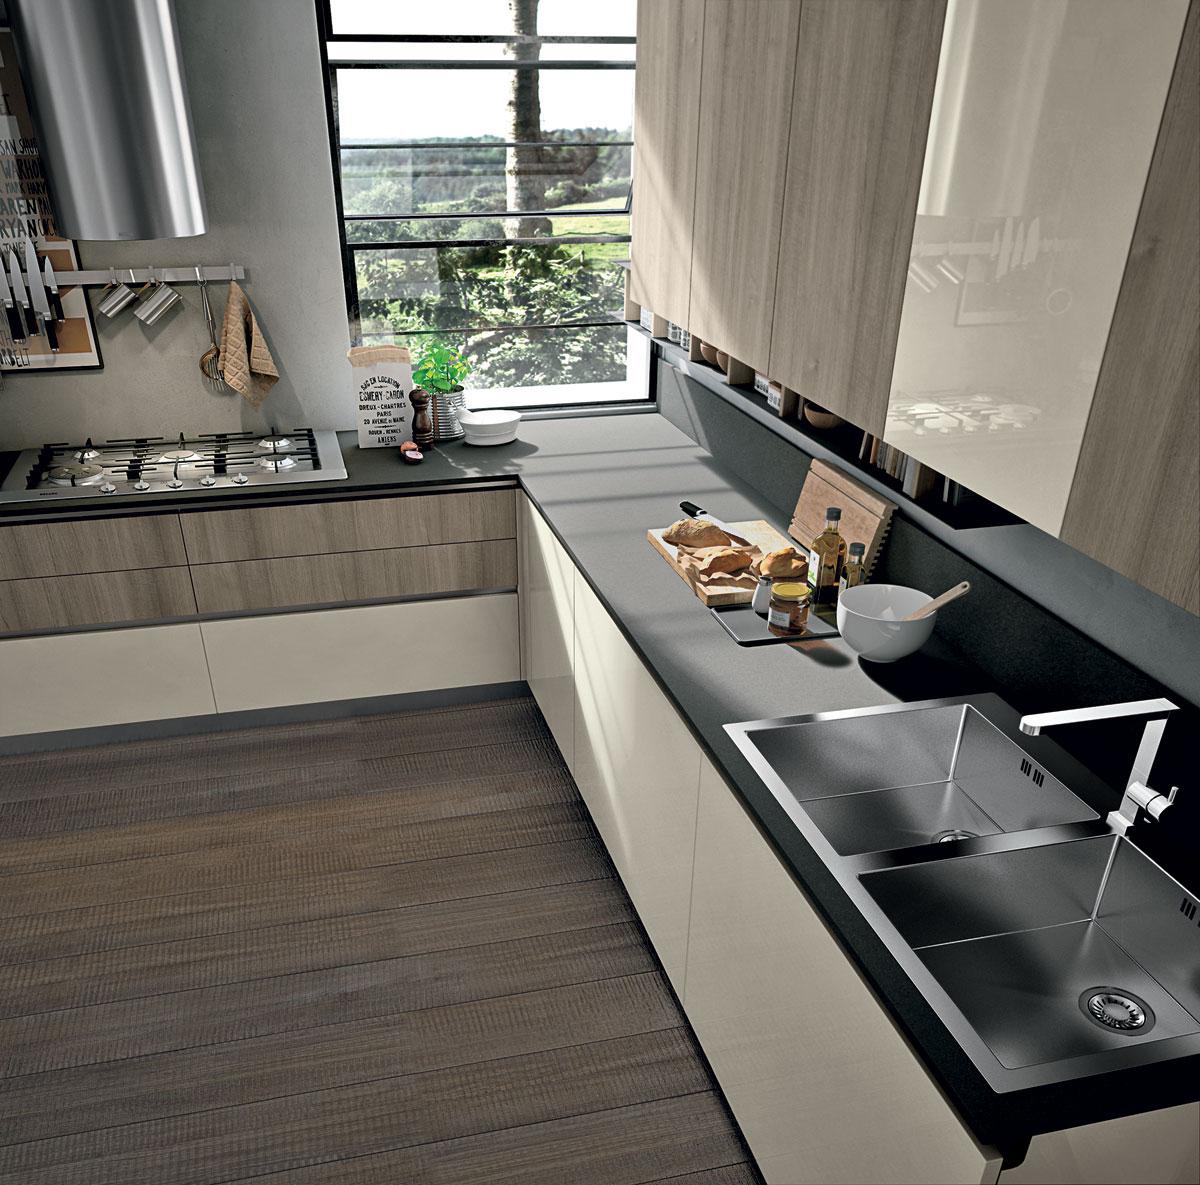 ... Eurolife Furniture By Maya Eurolife Kitchens Sydney ...